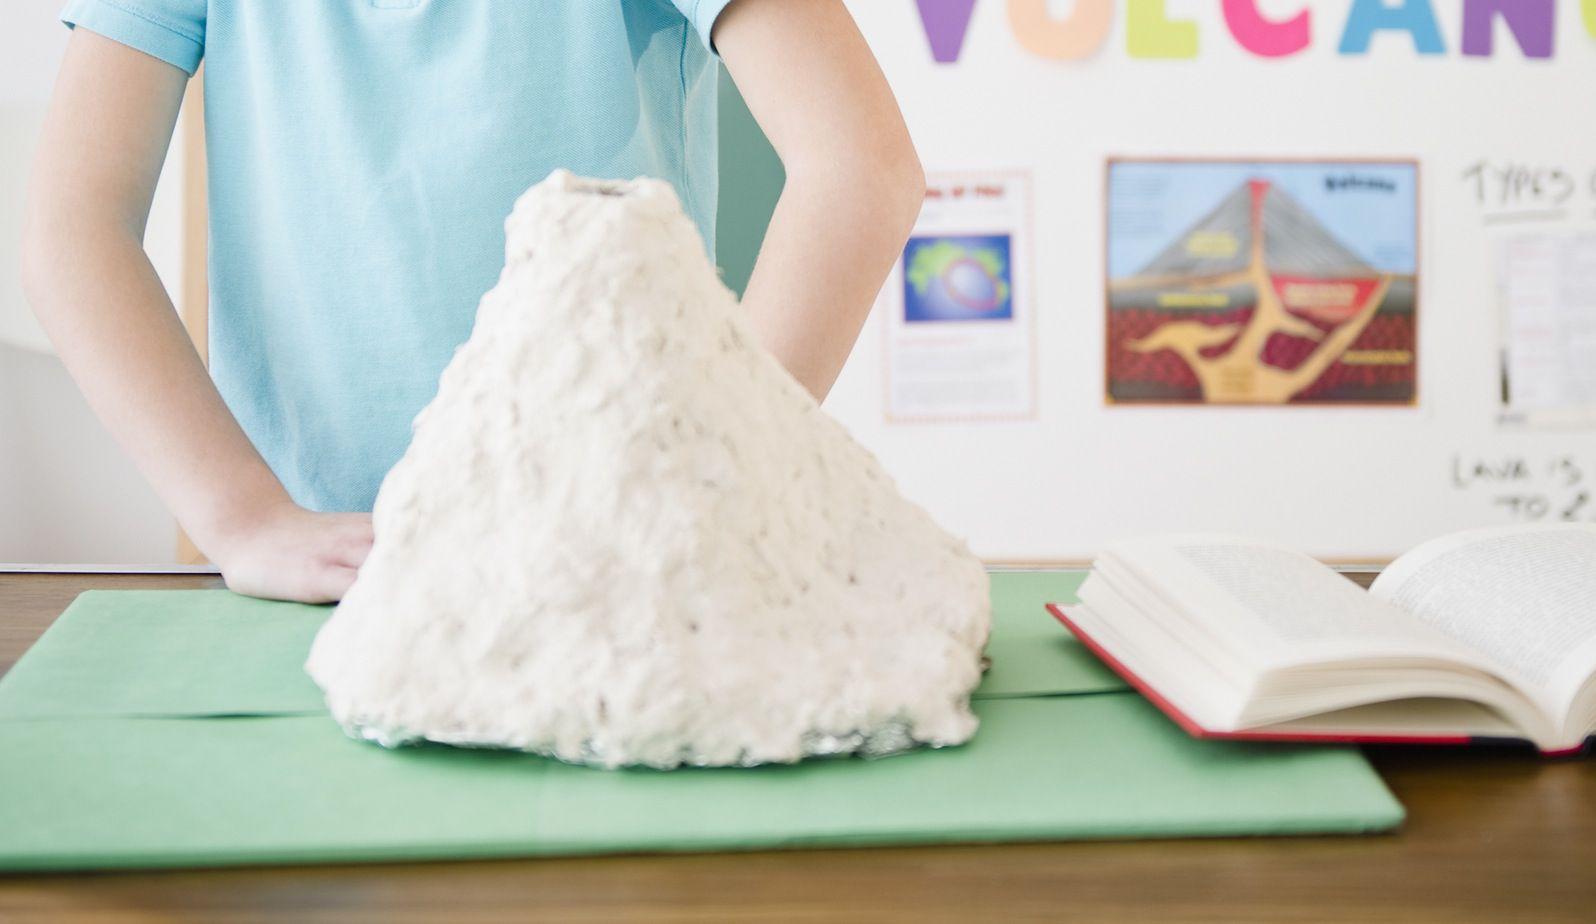 A model volcano